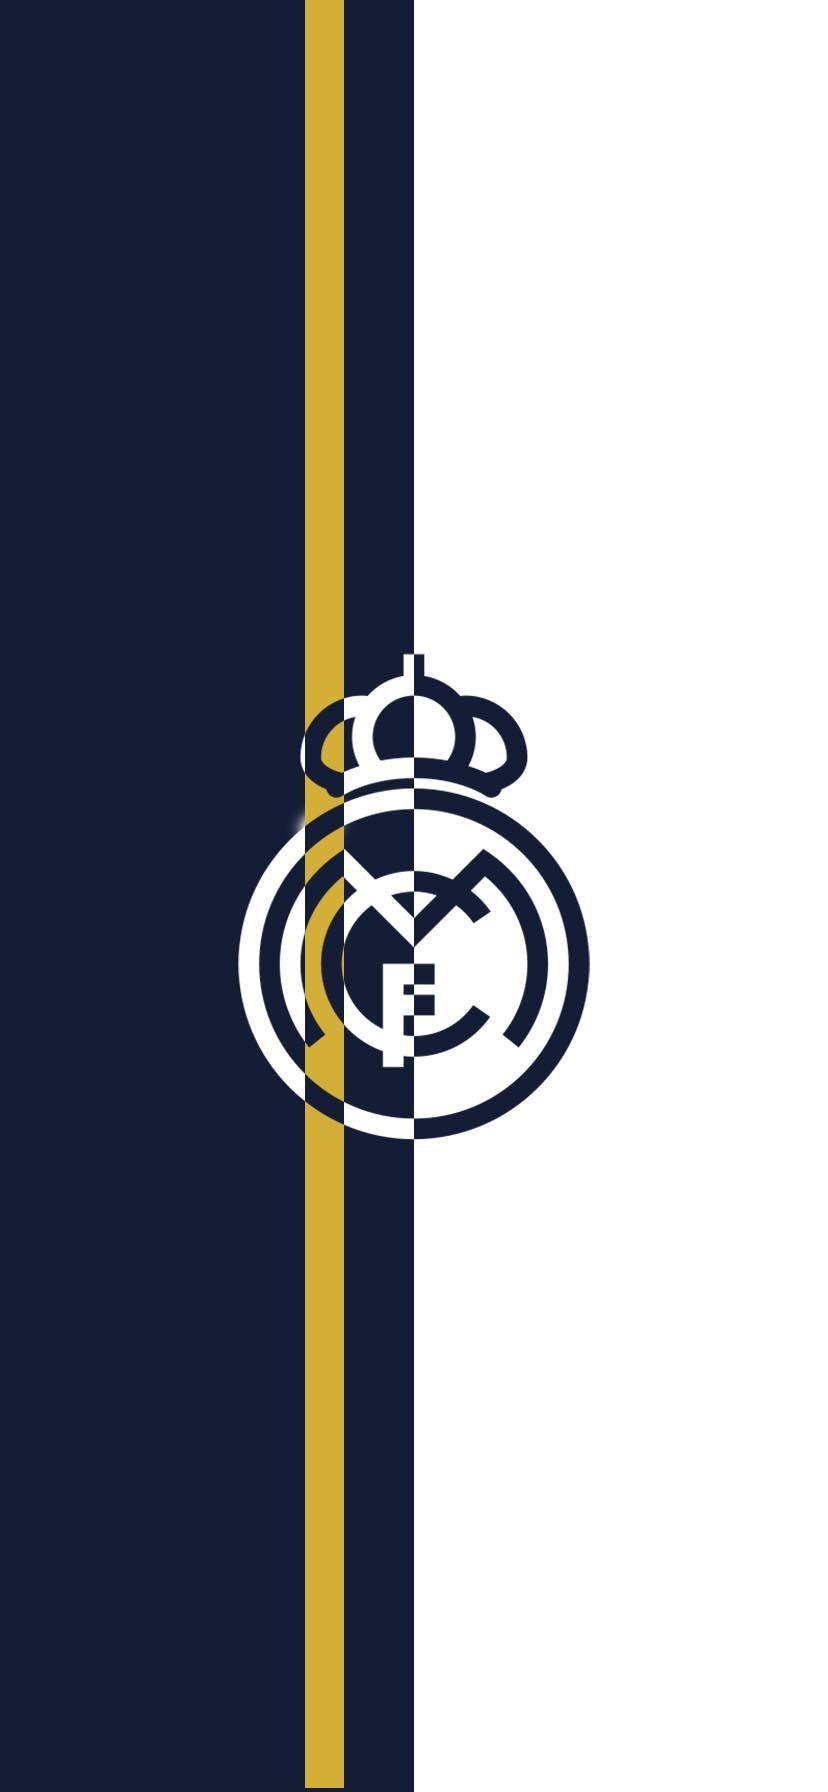 Lock Screen Real Madrid Wallpaper Iphone Hd Football In 2020 Real Madrid Wallpapers Madrid Wallpaper Real Madrid Logo